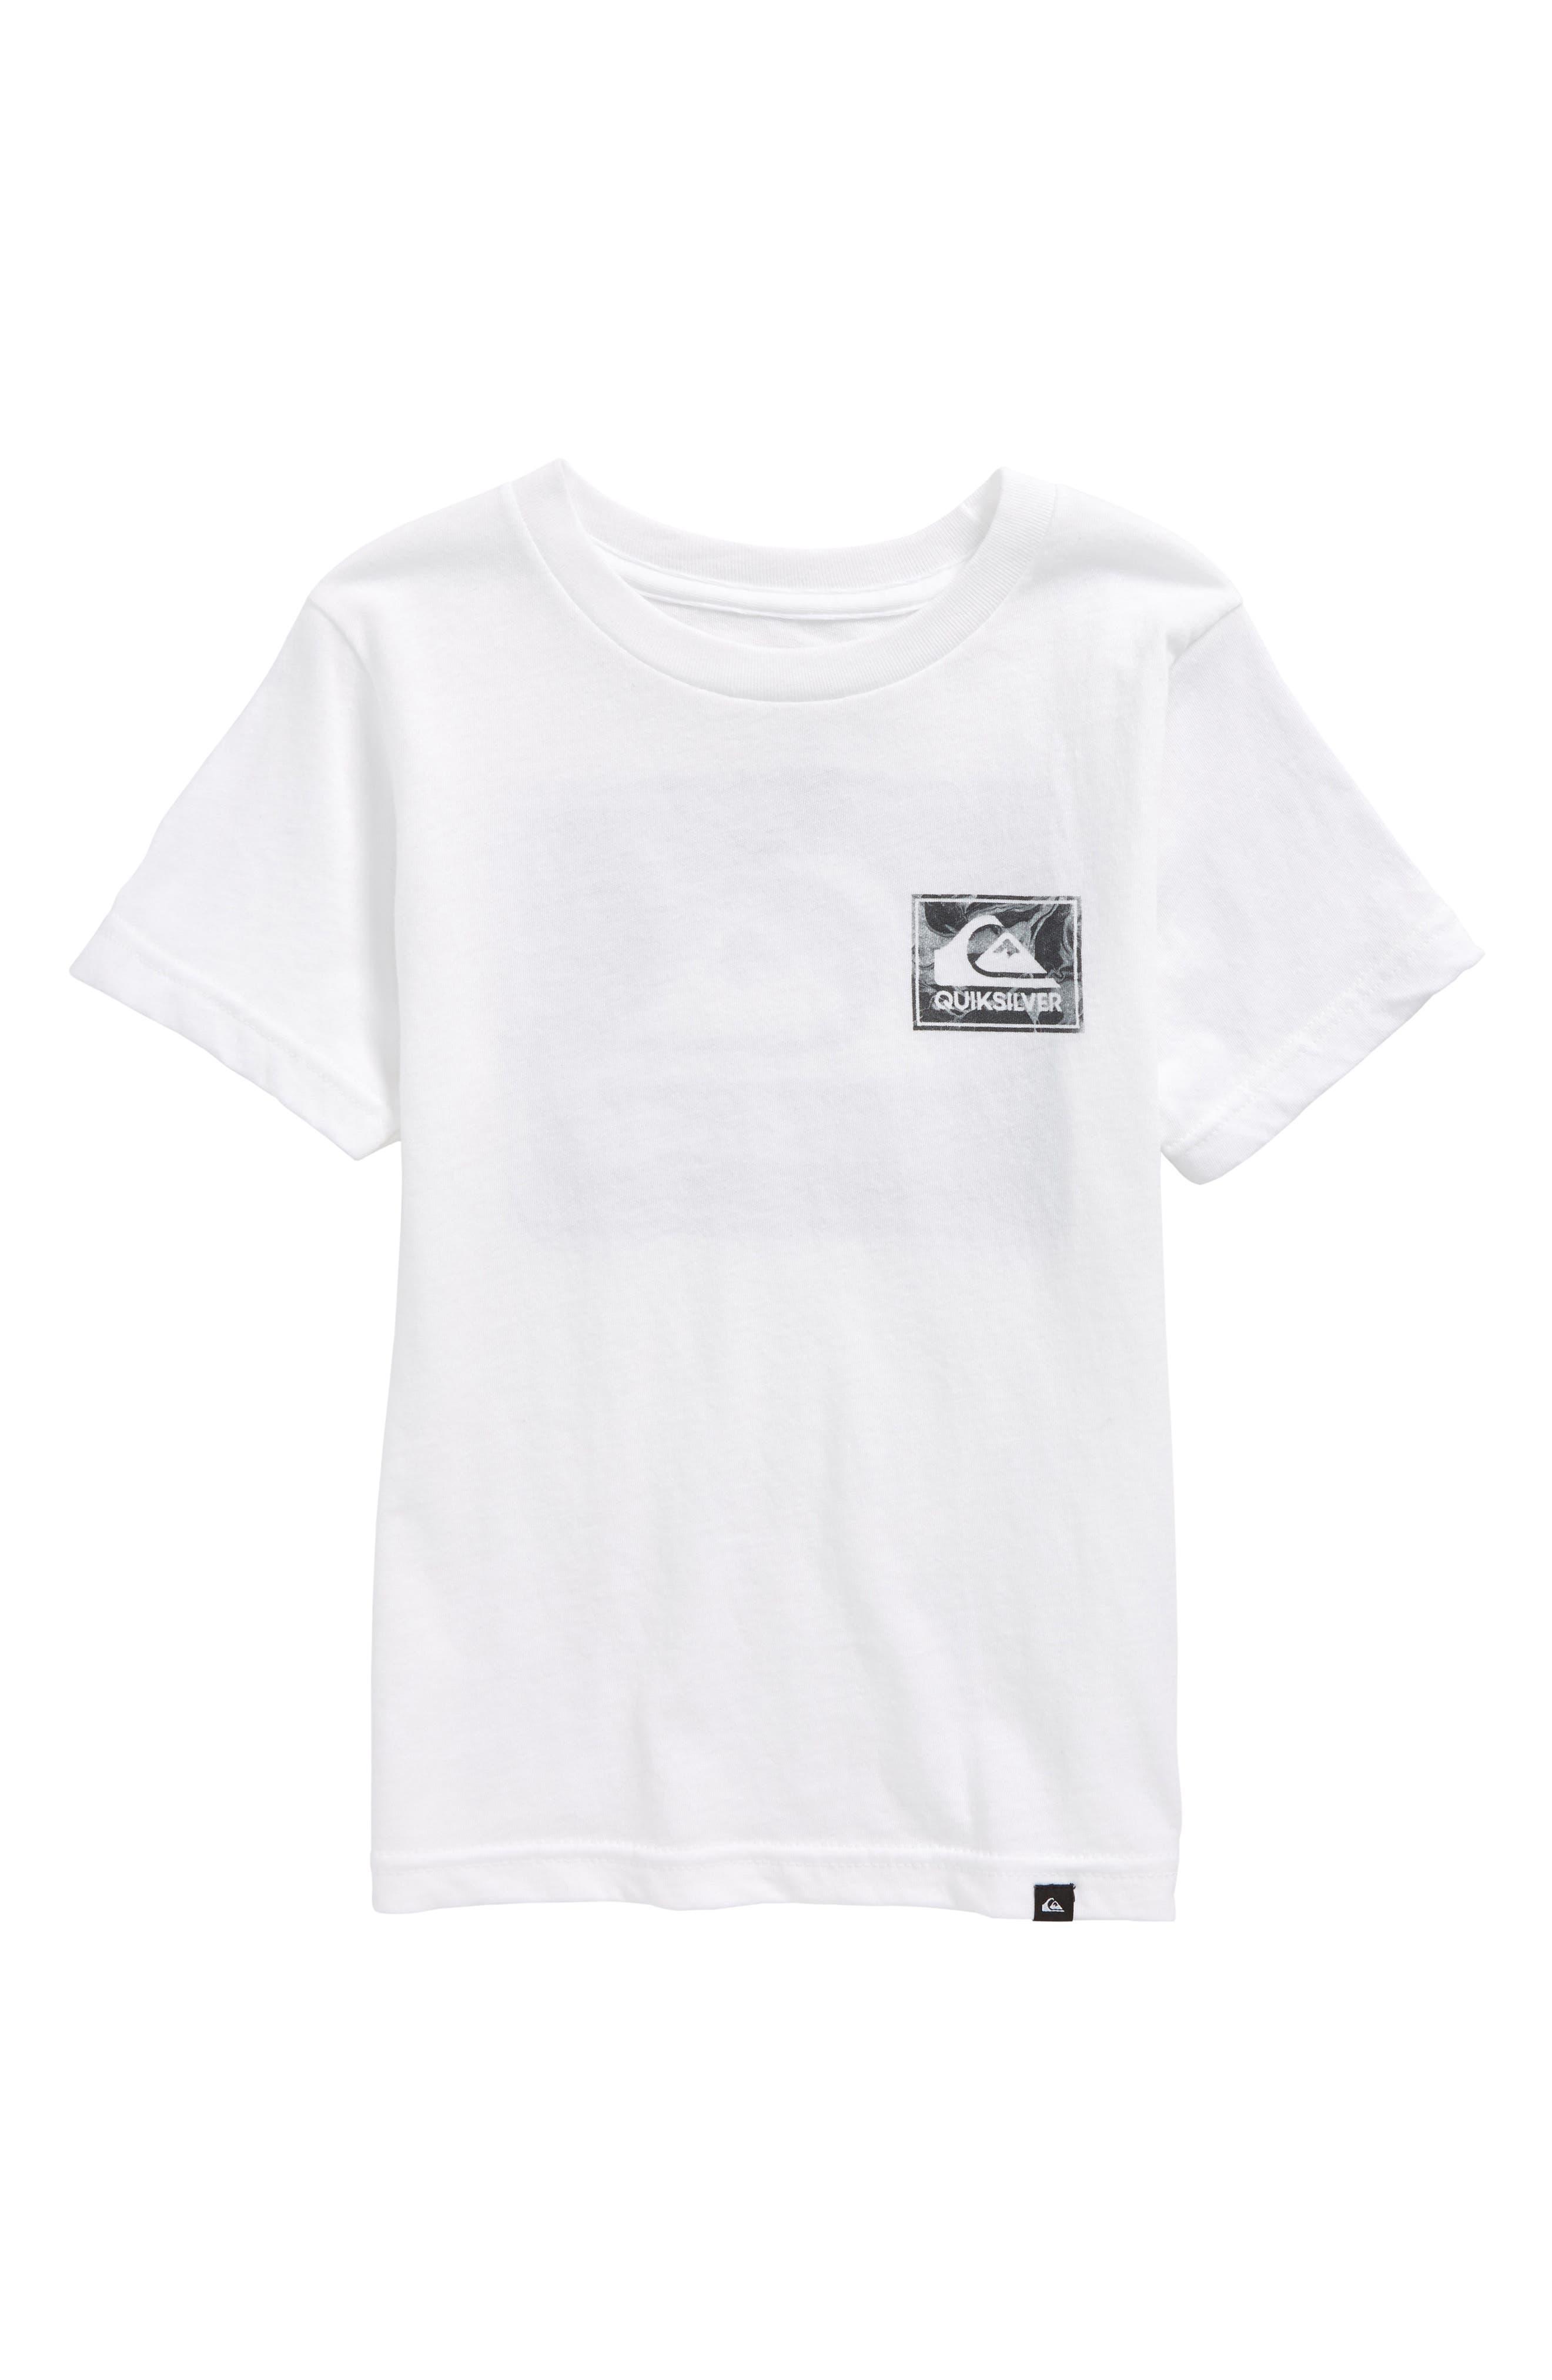 Quiksilver Volcano Blues T-Shirt (Toddler Boys & Little Boys)